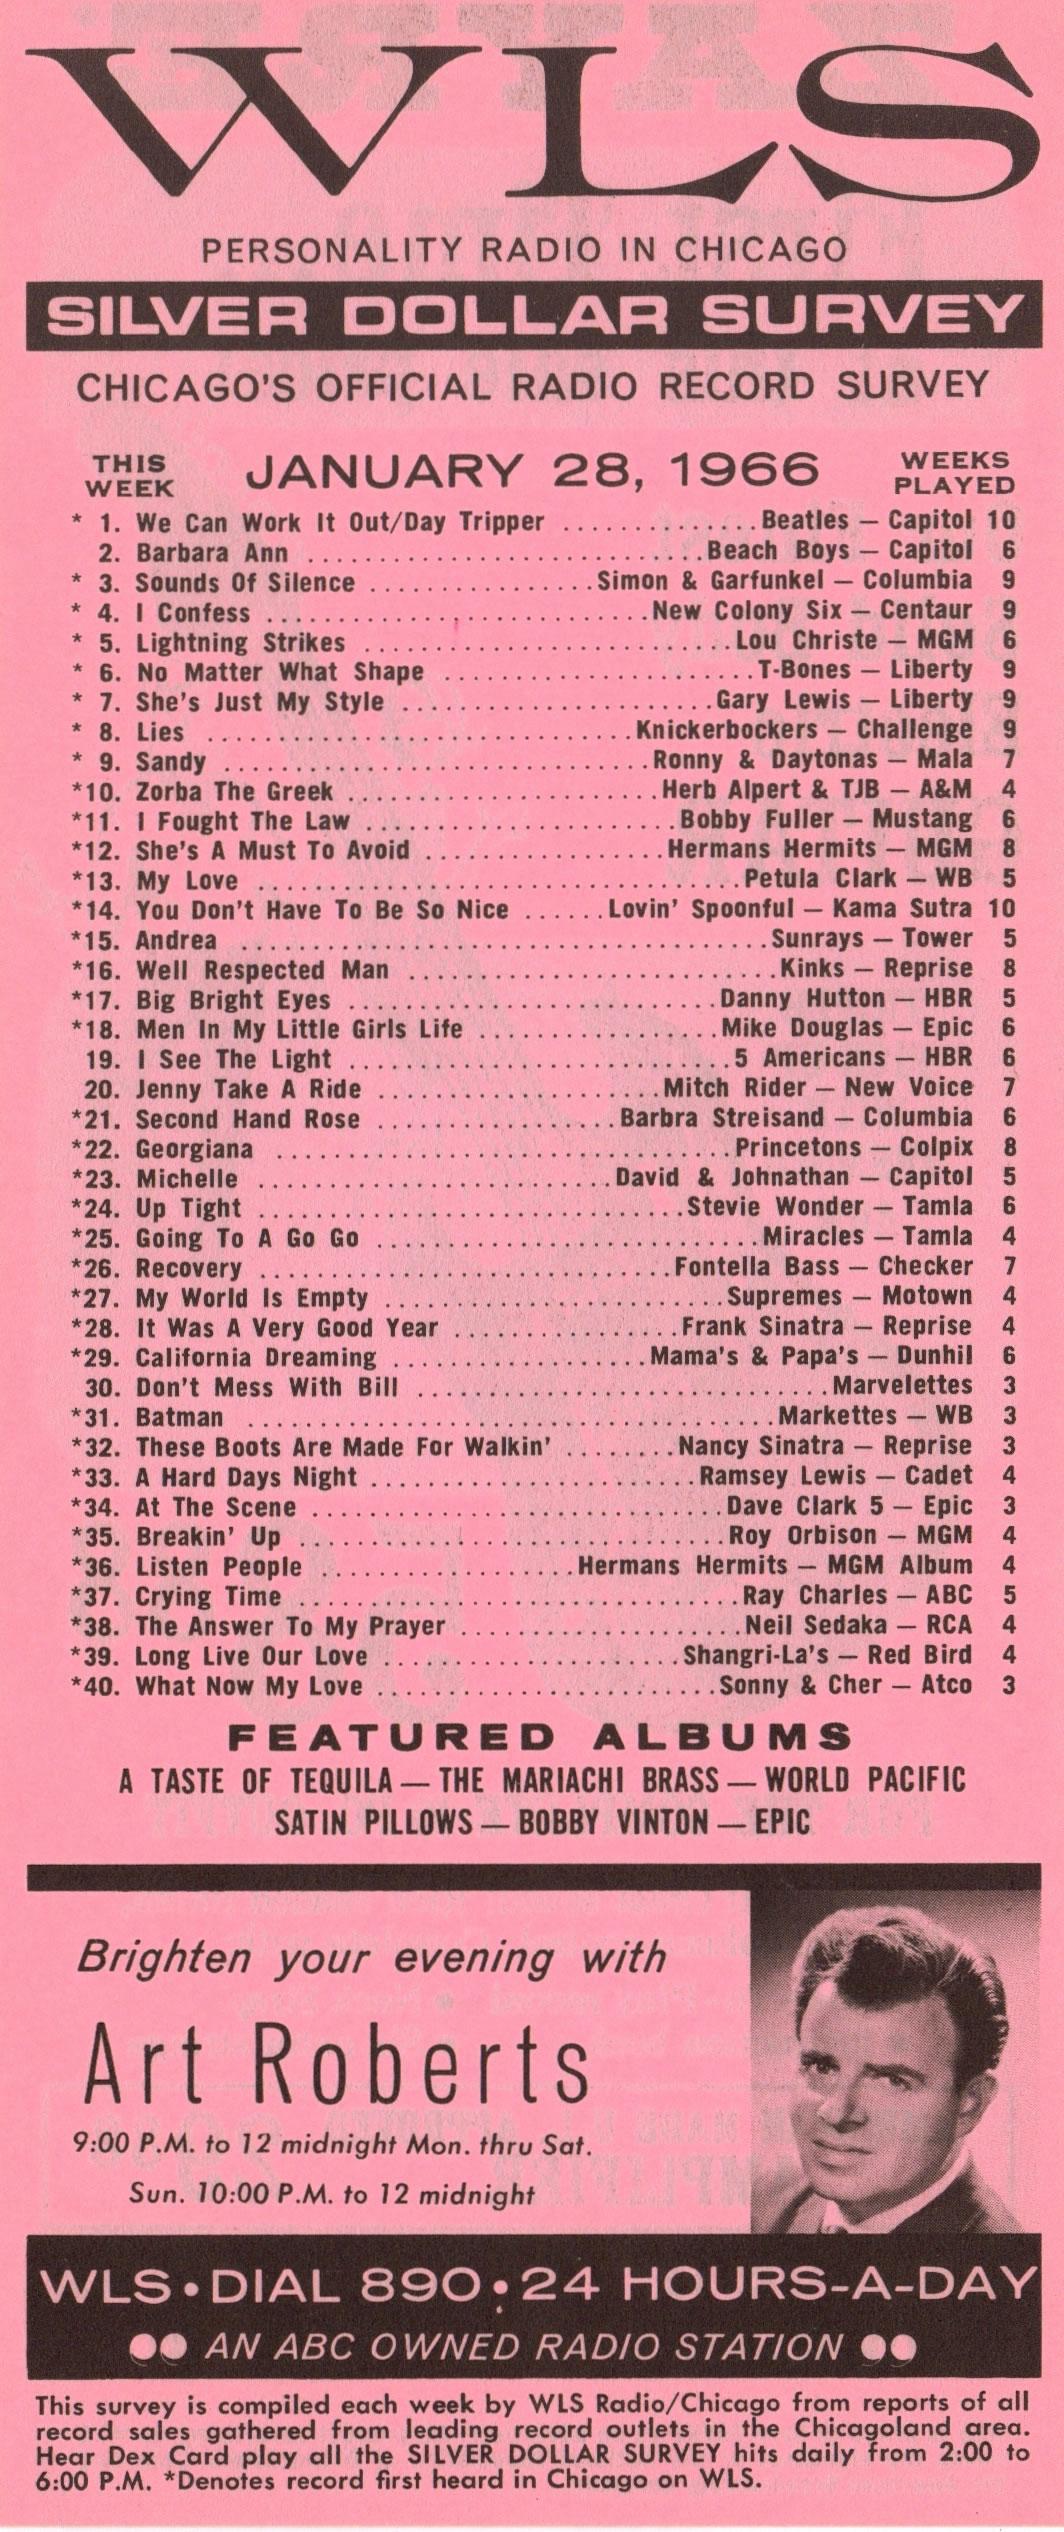 JANUARY 28, 1966 - ART ROBERTS